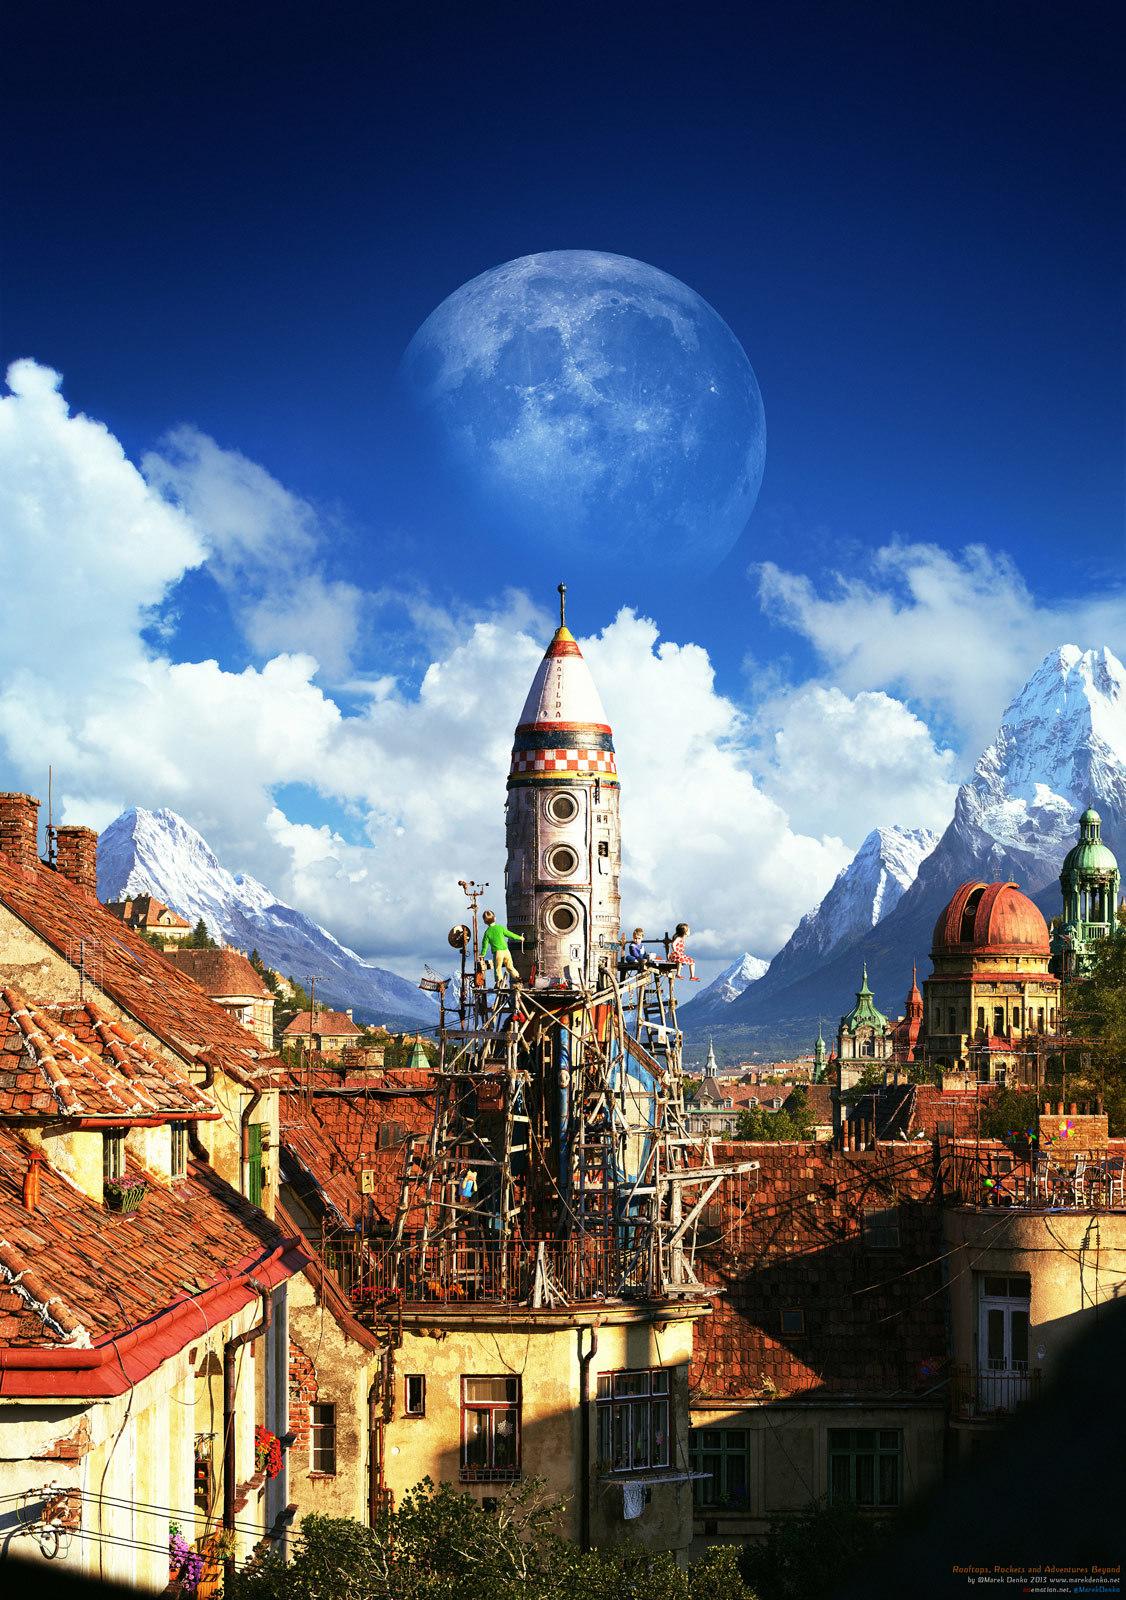 Denkom rooftops rockets and 1 efeb8db0 x8i0